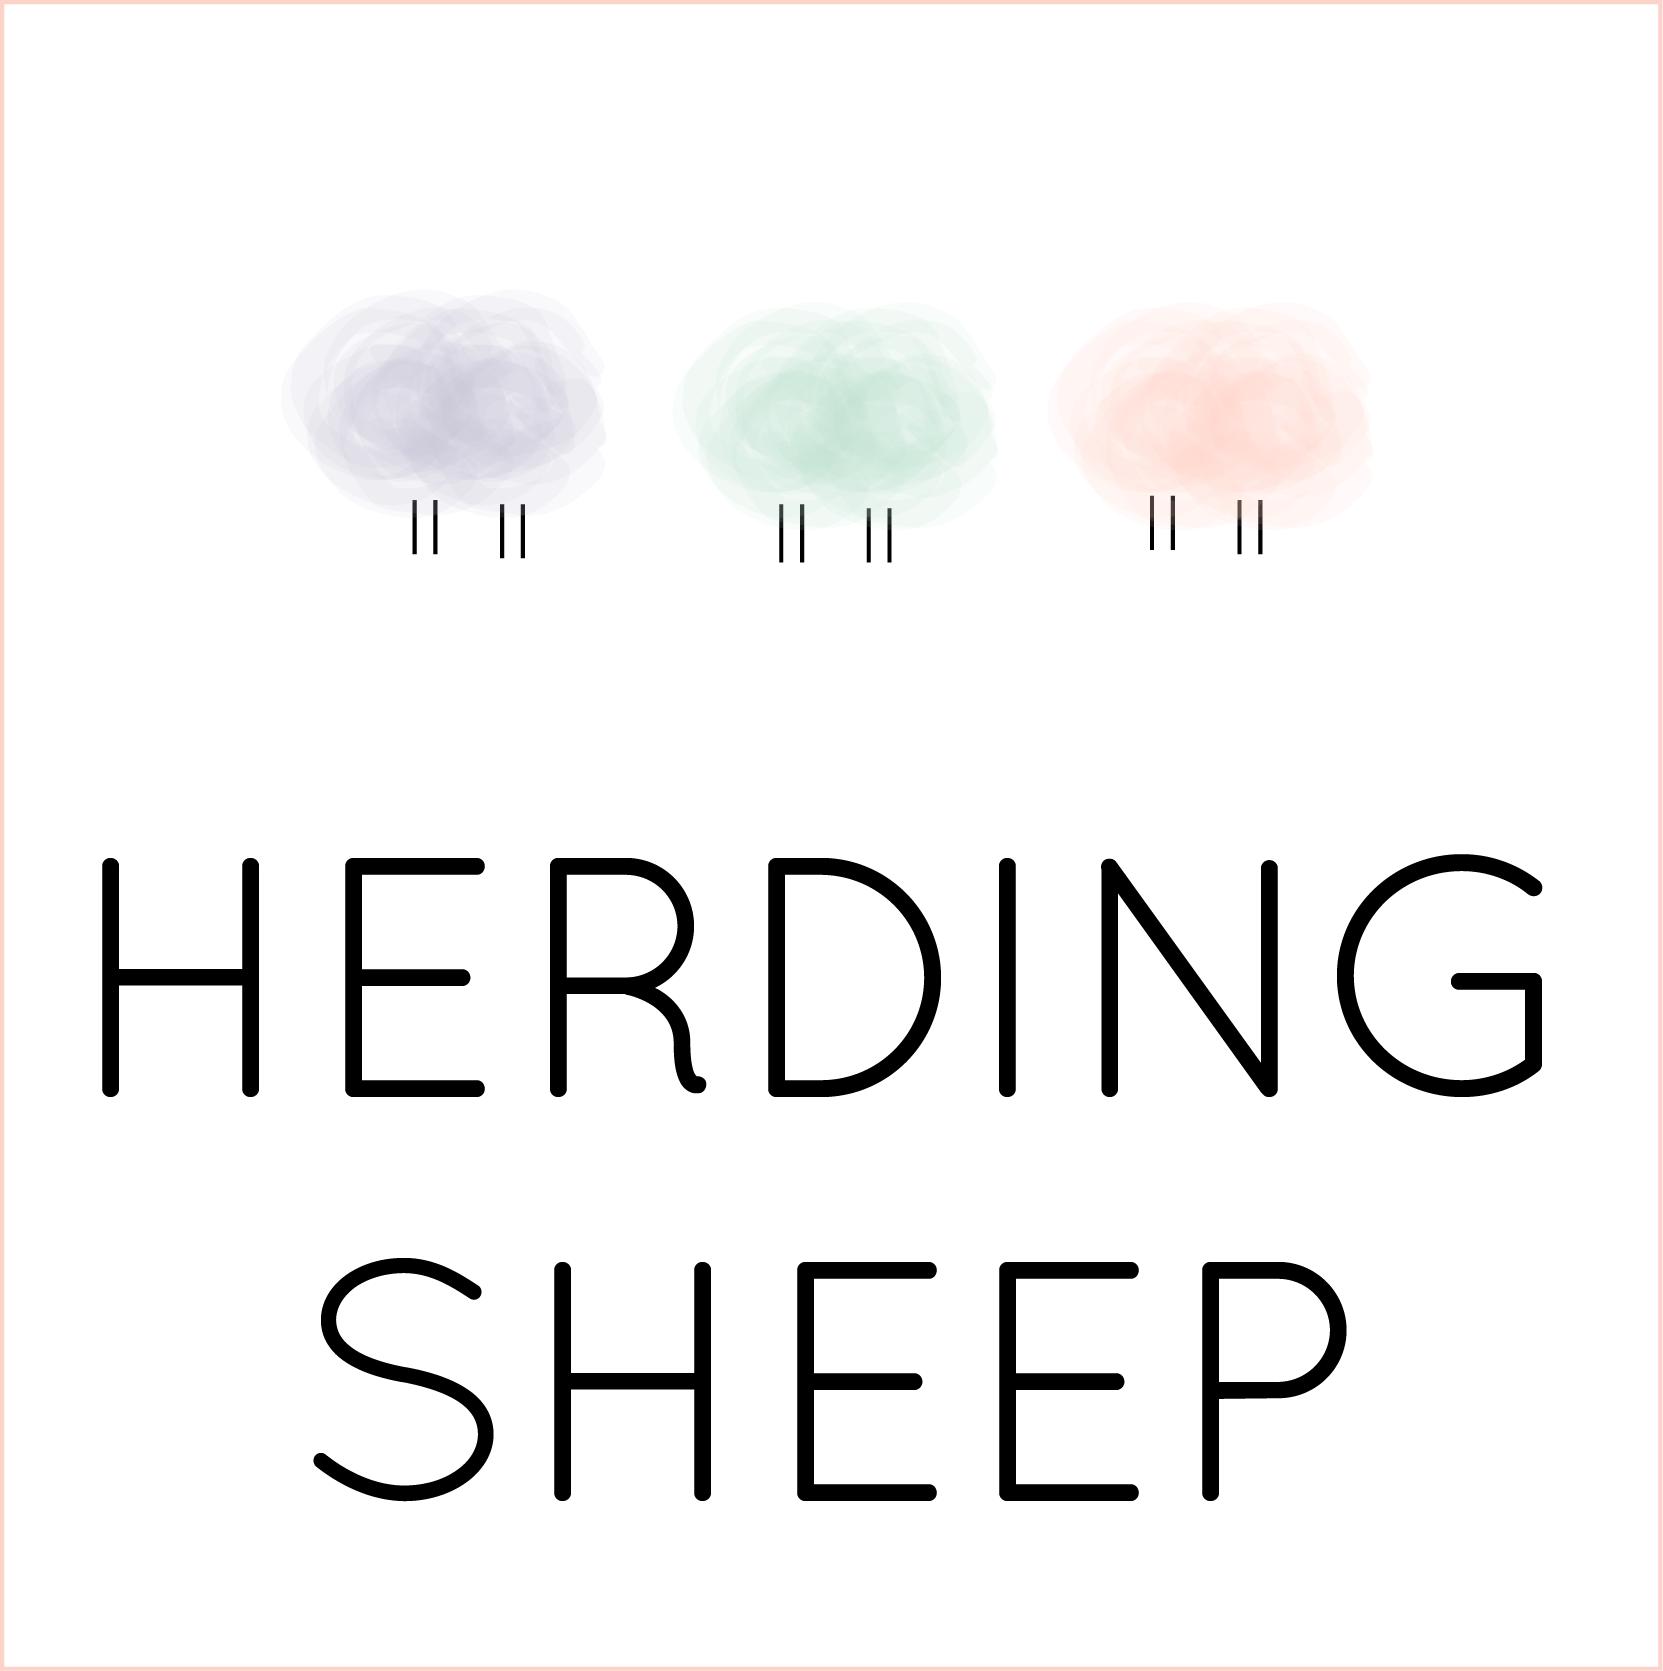 Herding sheep.png